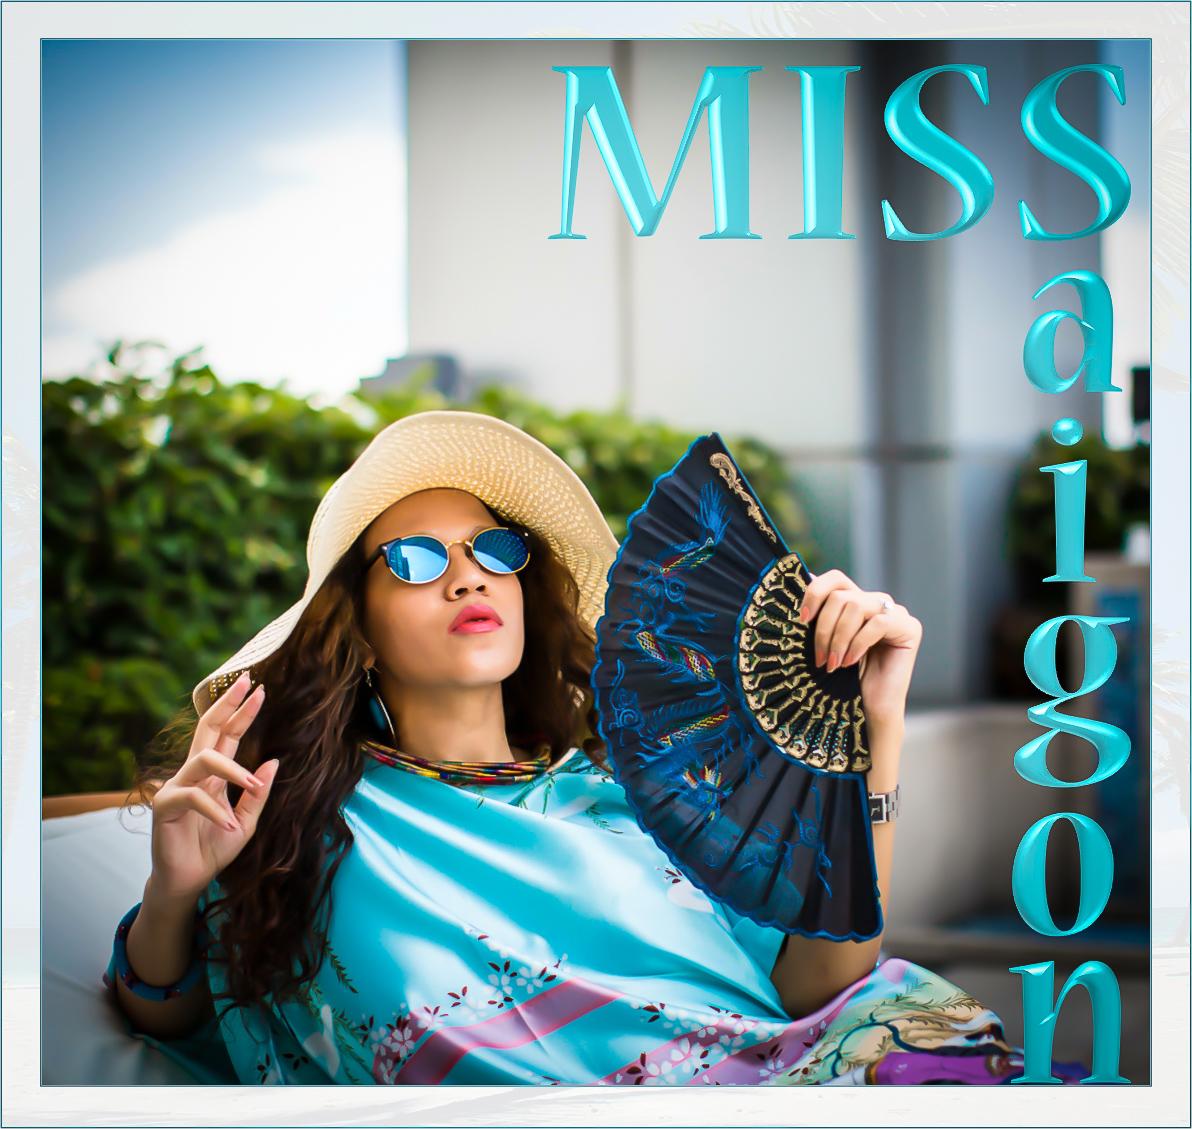 most-fashionable-style-blogger-australia_miss-saigon_vietnam-fashion-editorials_best-orientalfashion-blogs_best-oriental-fashion-editorials_best-new-personal-style-blogs-2014_best-personal-style-bloggers-melbourne_international-bloggers-australia_exotic-fashion-bloggers-melbourne-australia_vietnamese_fashion-bloggers-11